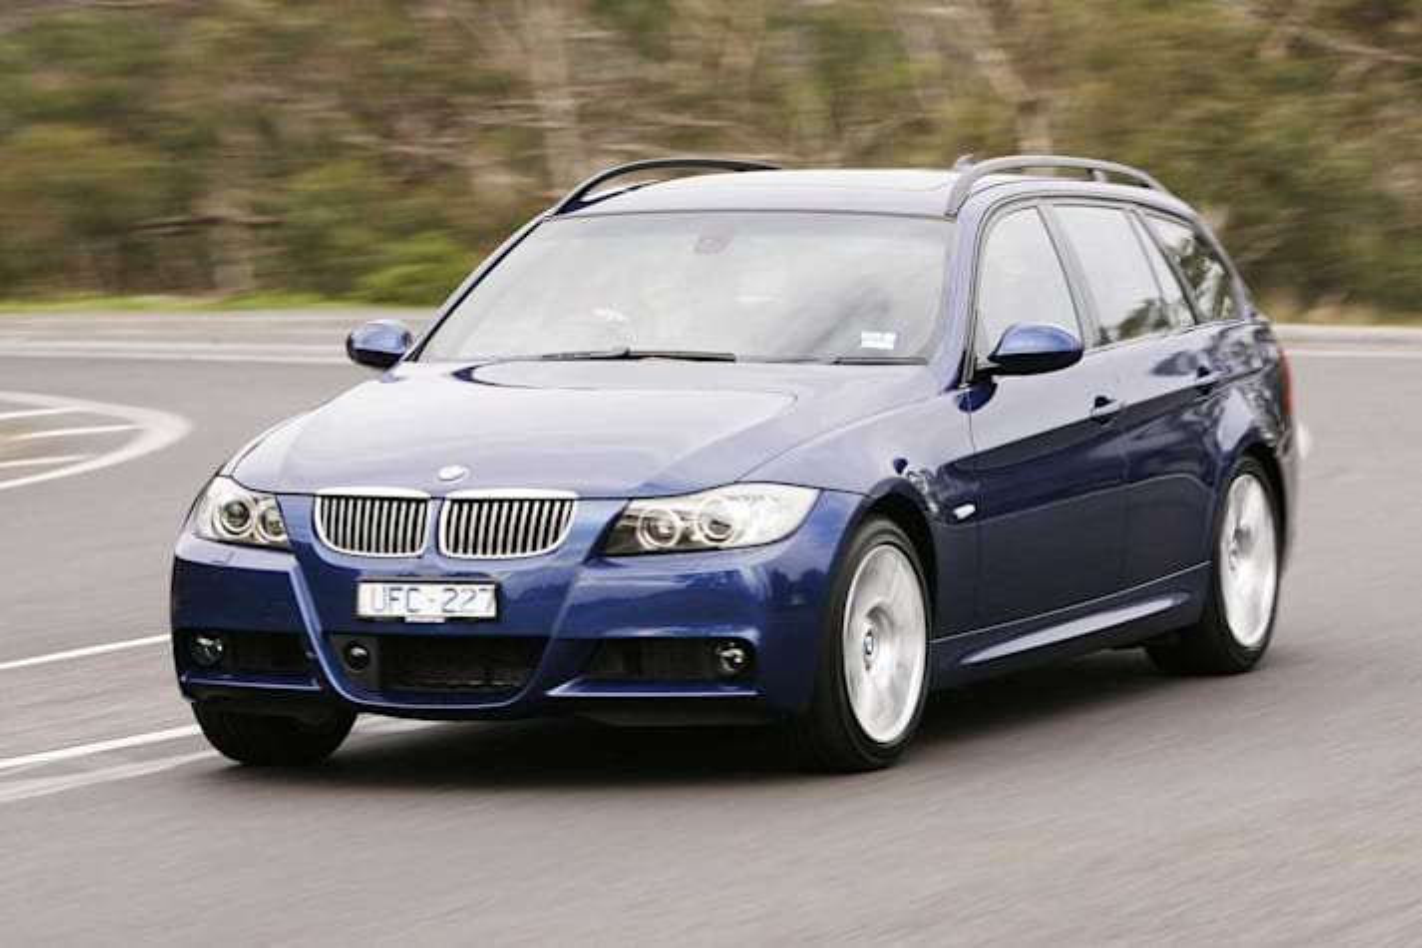 2006 BMW 323i Touring M Sport review